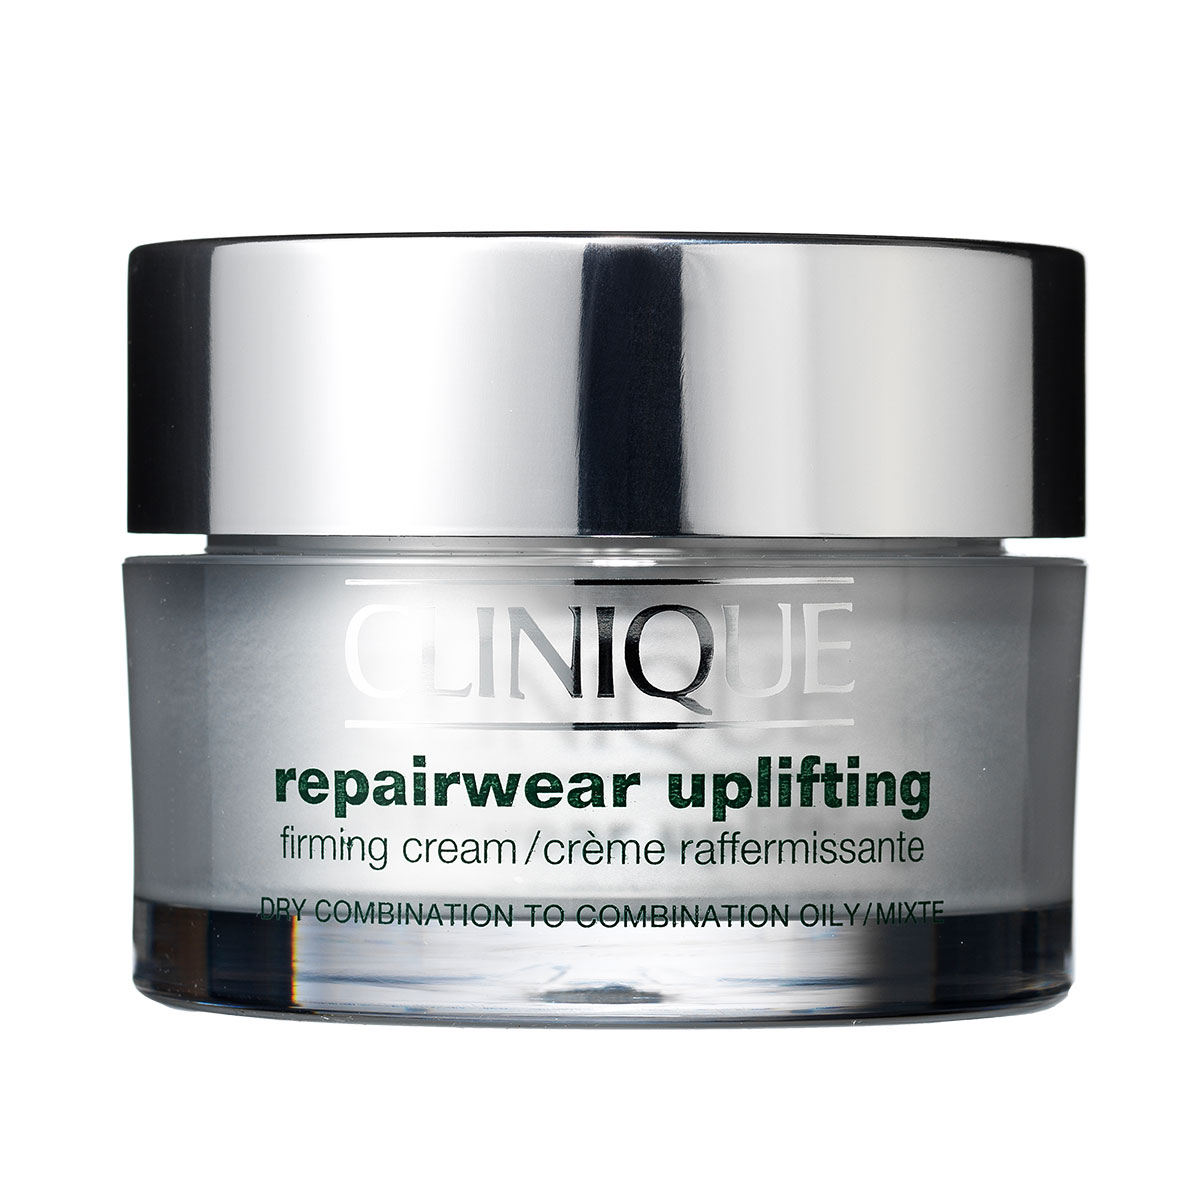 Image of   Clinique Repairwear Uplifting Firming Cream - 50 ml